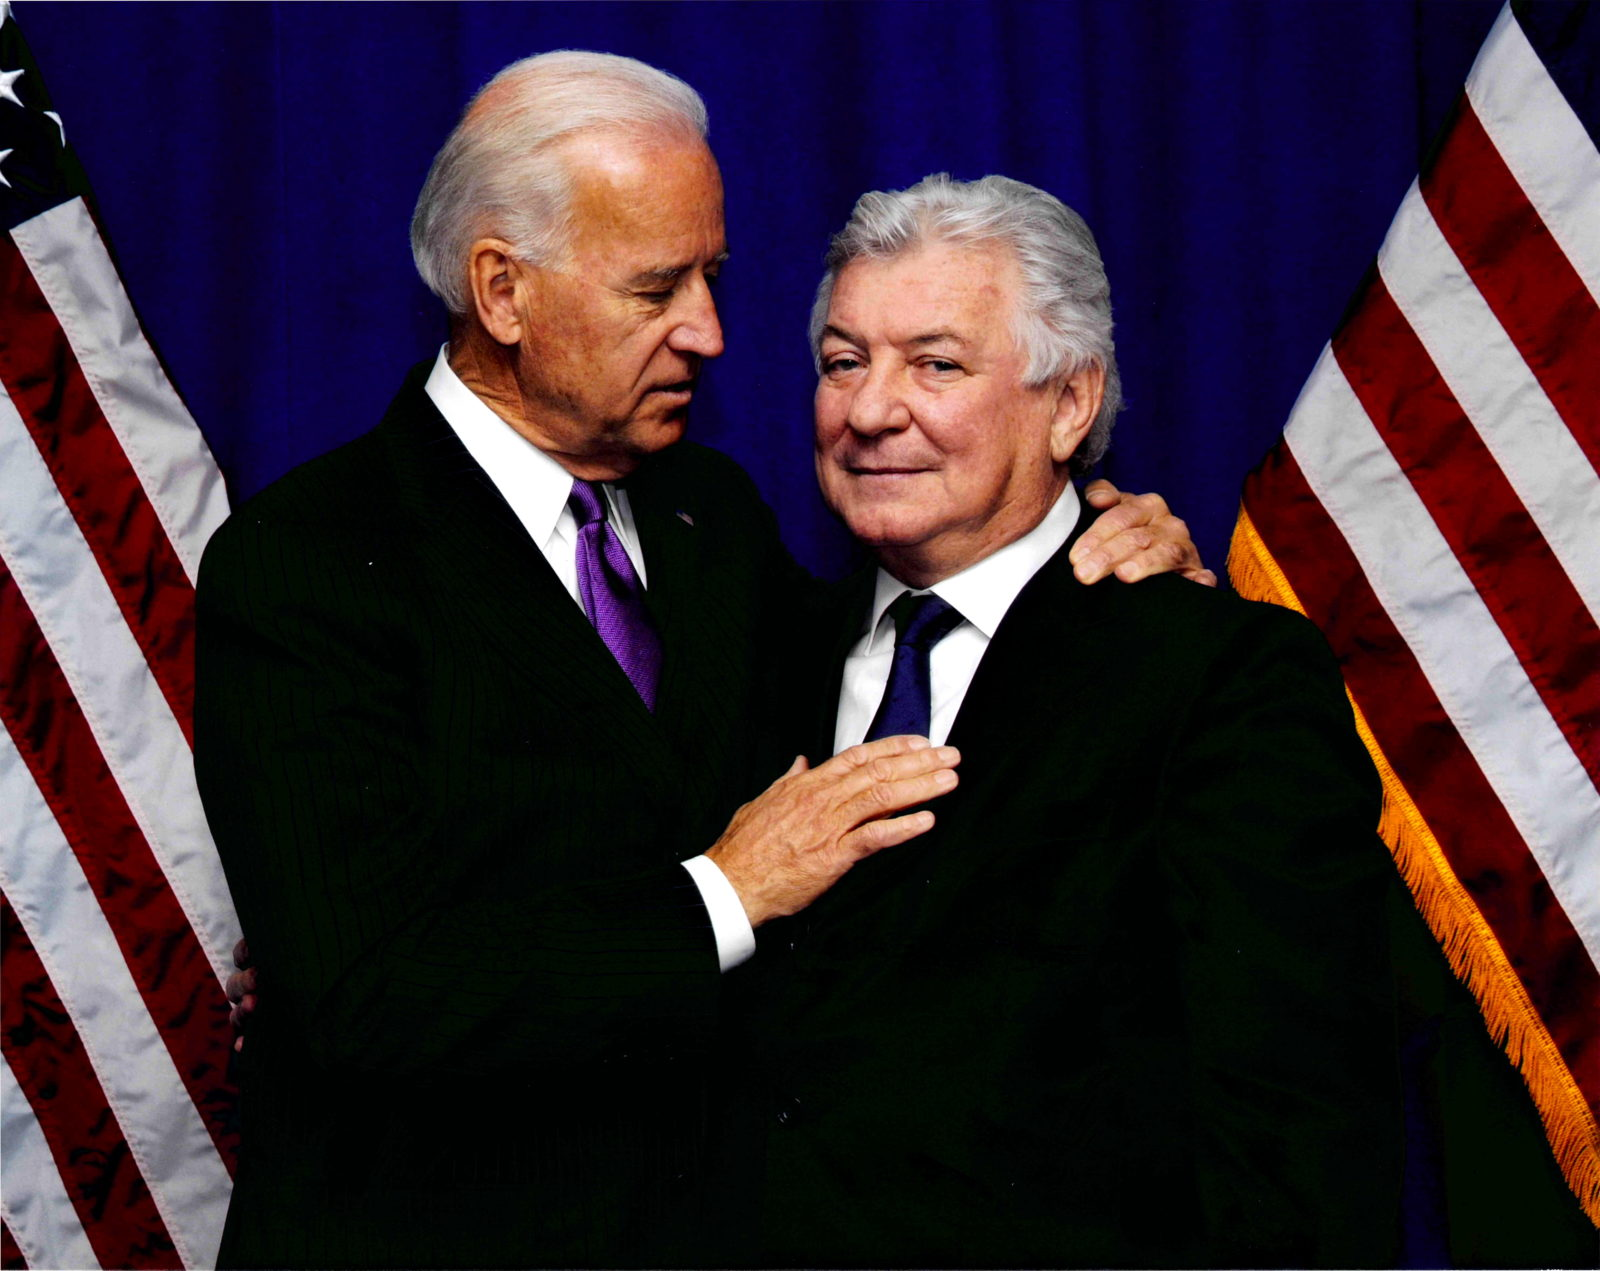 JACK ROSEN: I trust Biden to deal with Iran